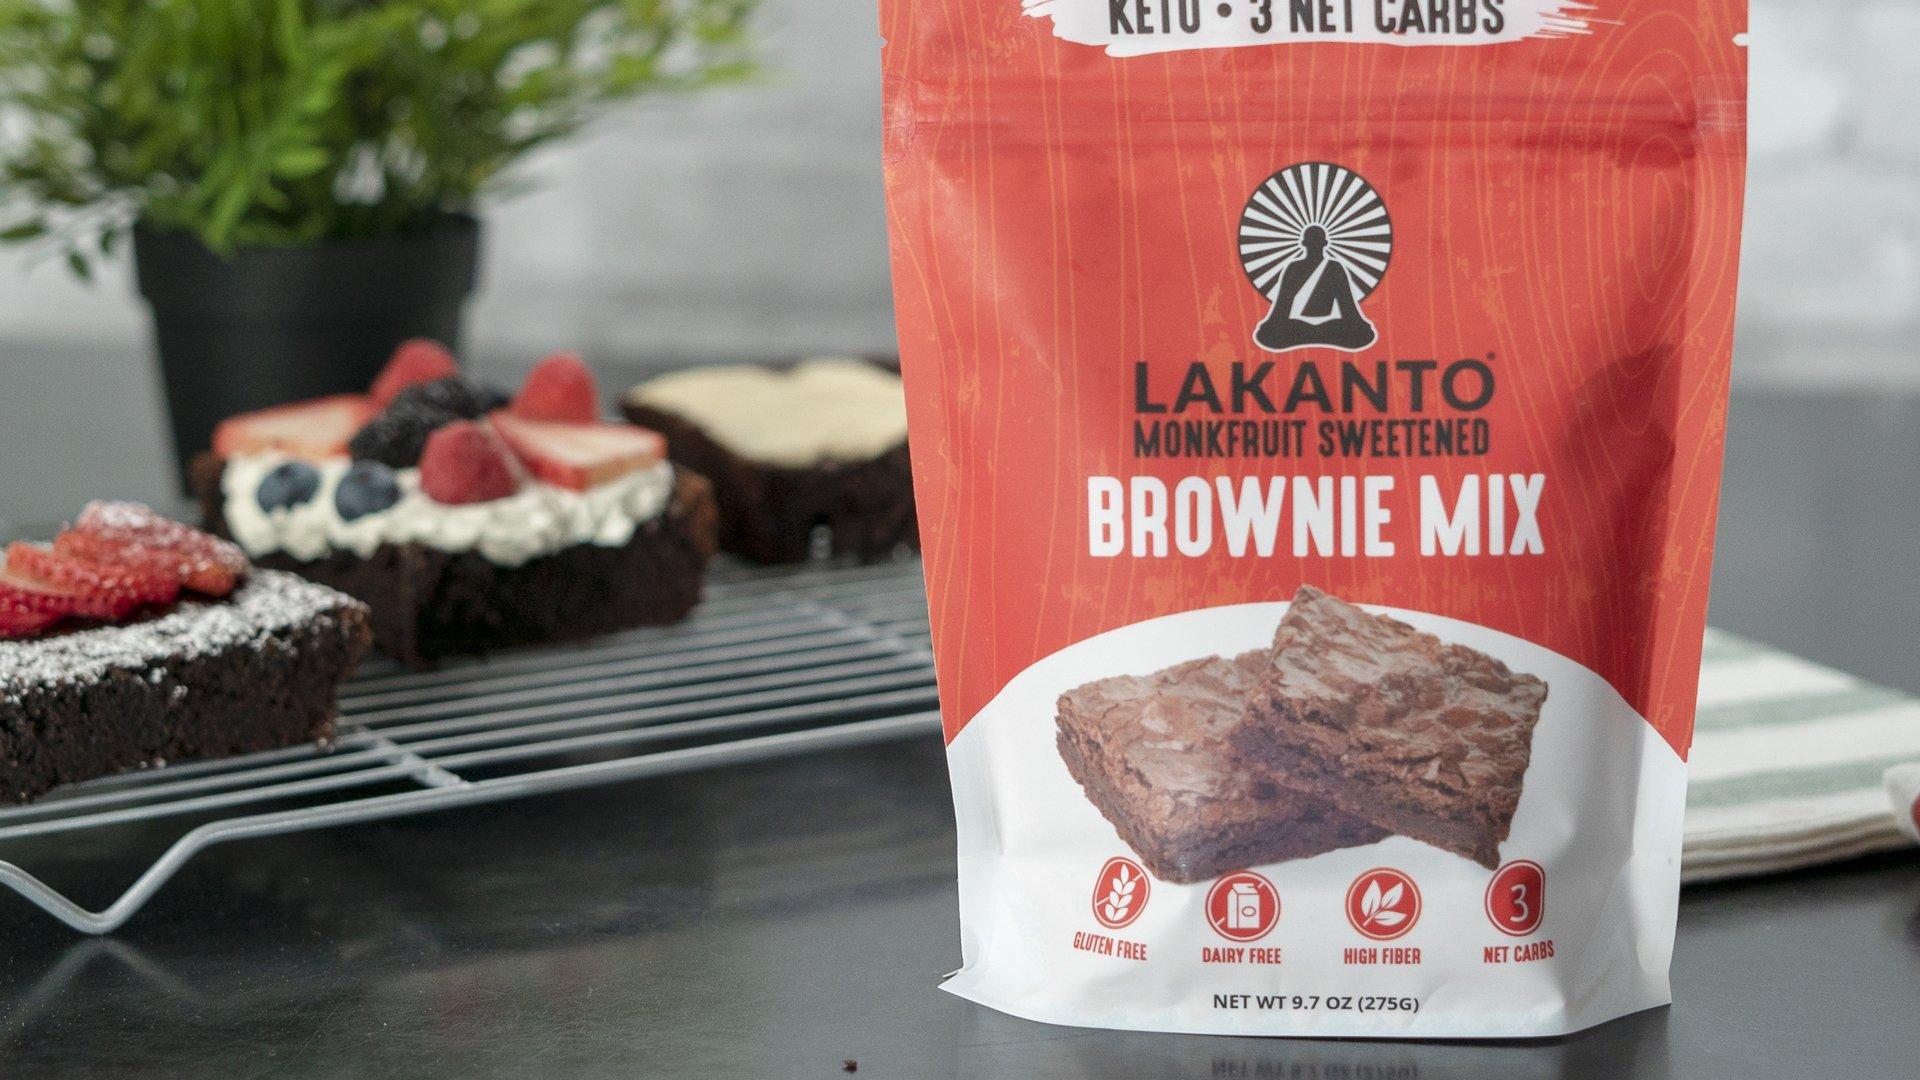 Lakanto Sugar-Free Brownie Mix | 3 net carbs | (Gluten-Free, 16 Servings) by Lakanto (Image #7)